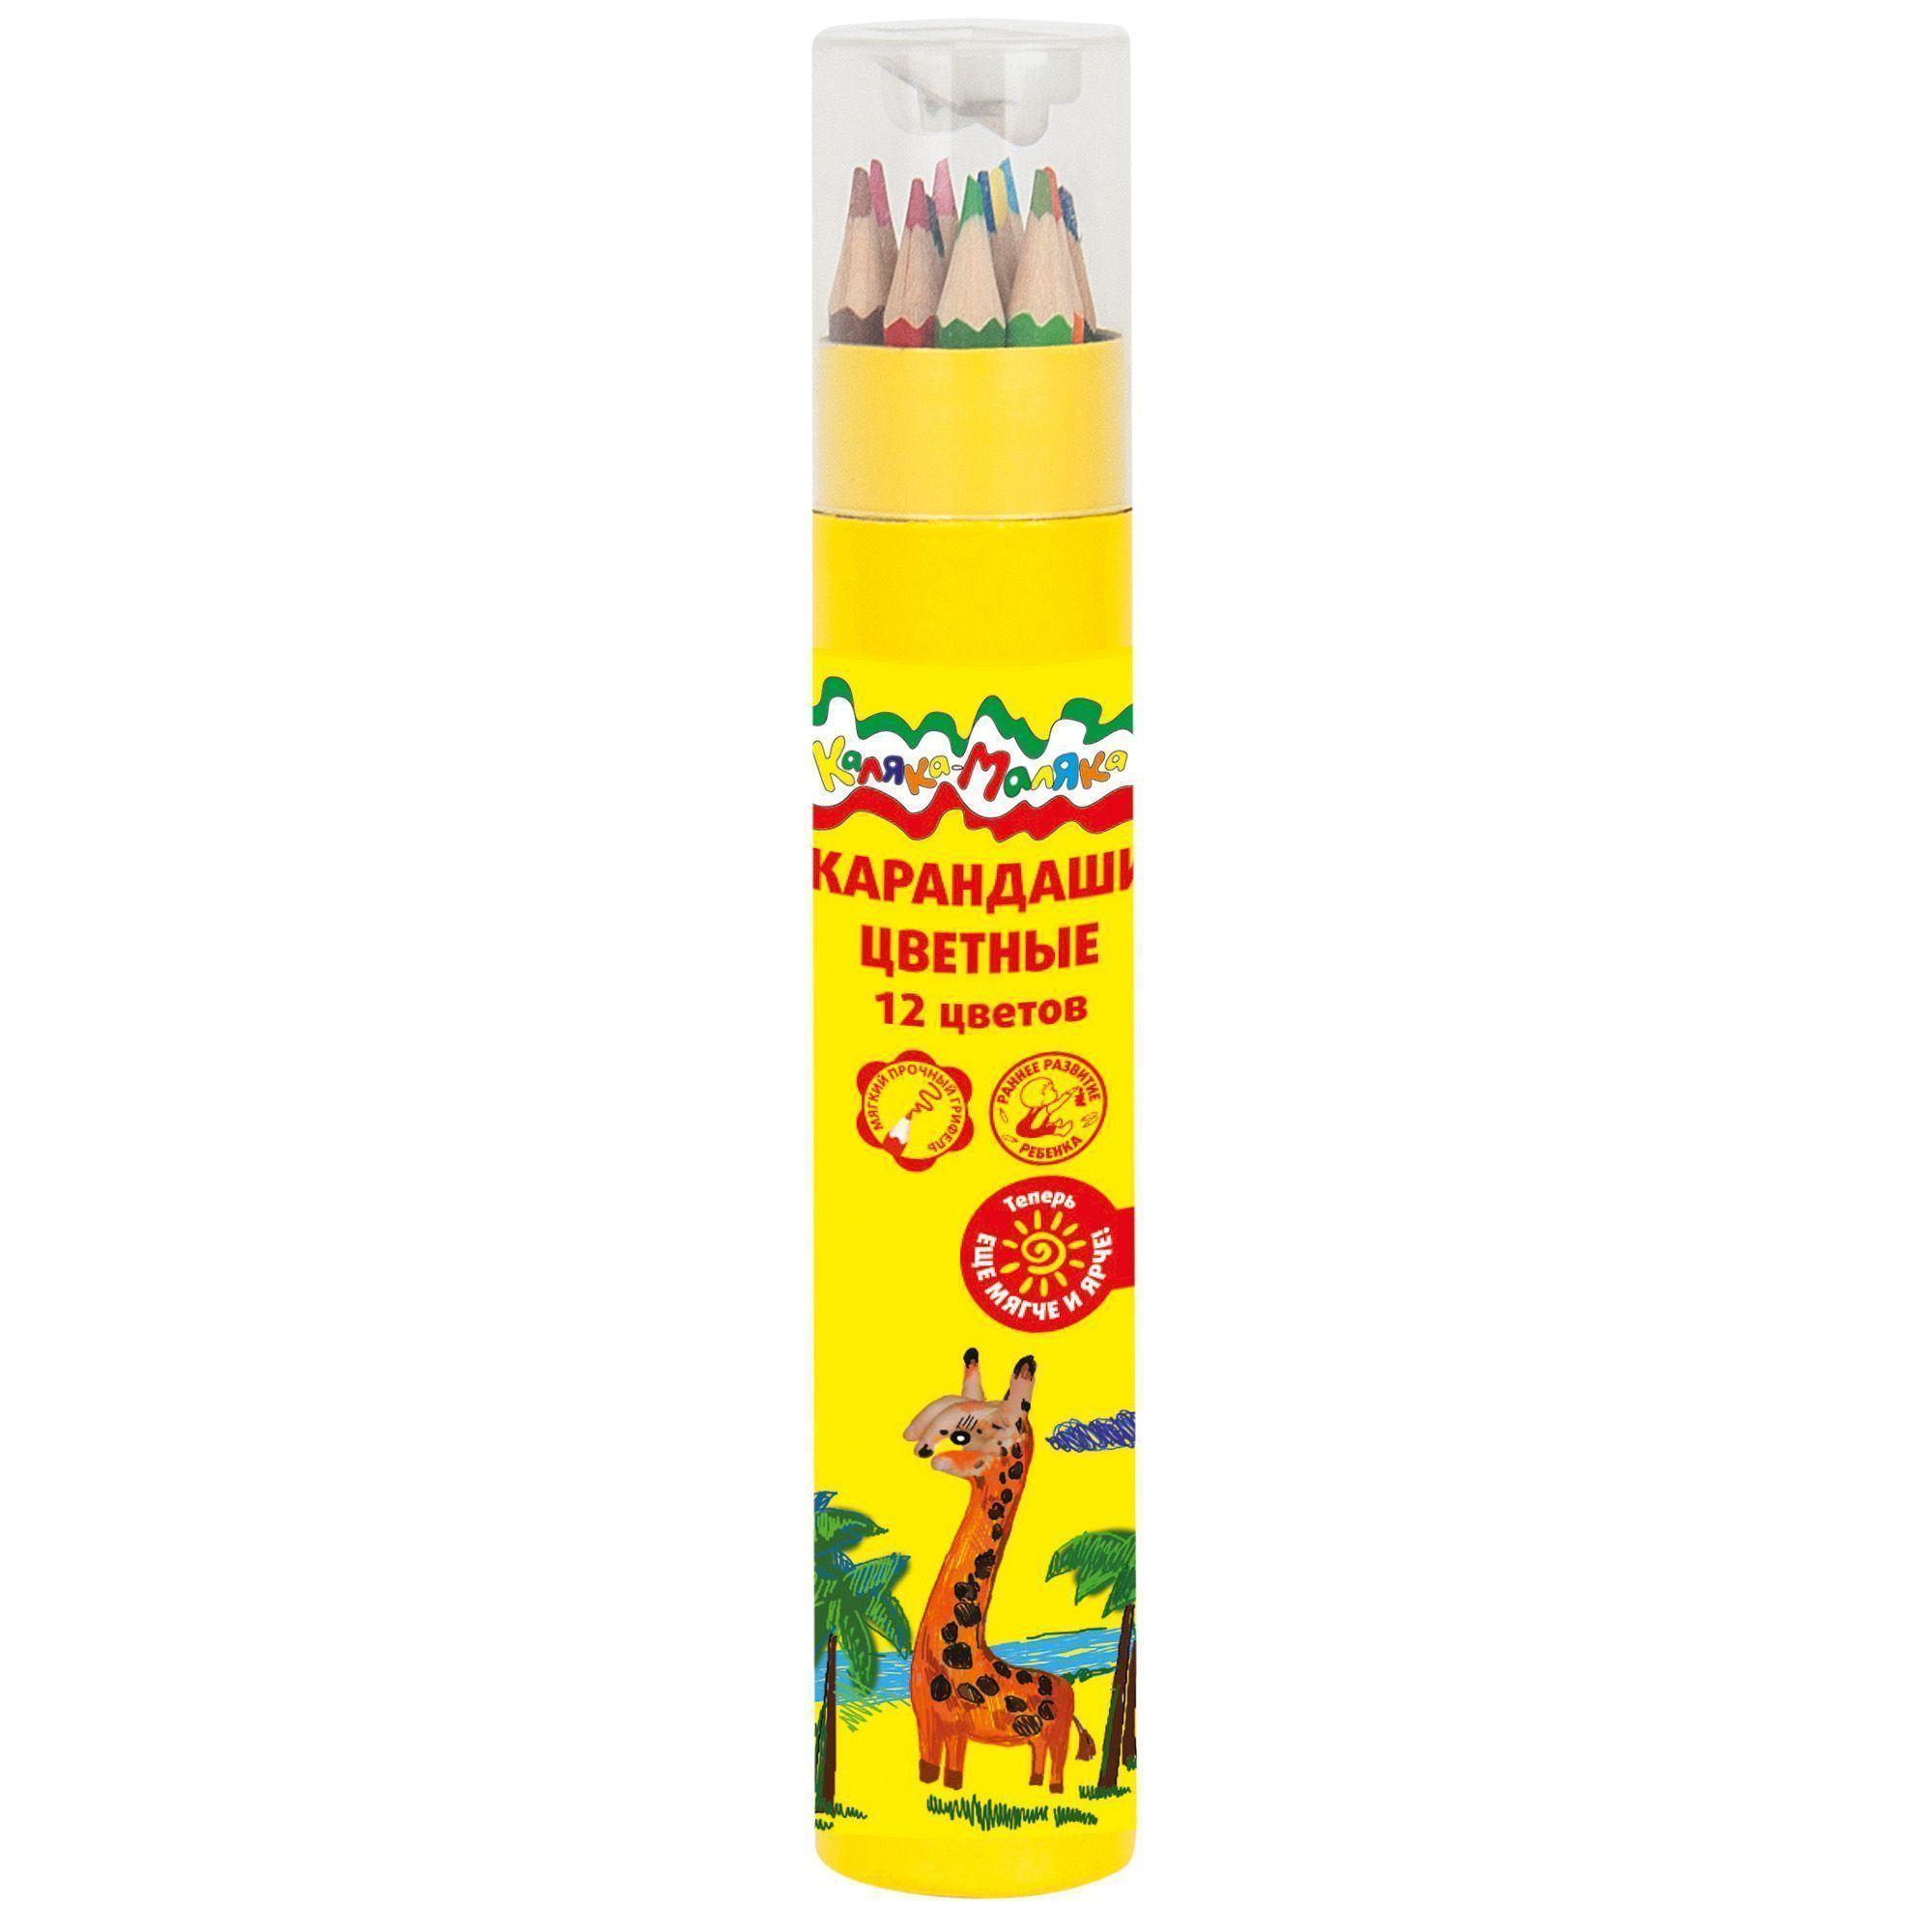 Карандаши цветные Каляка-Маляка 12 цветов, тубус с точилкой 3+